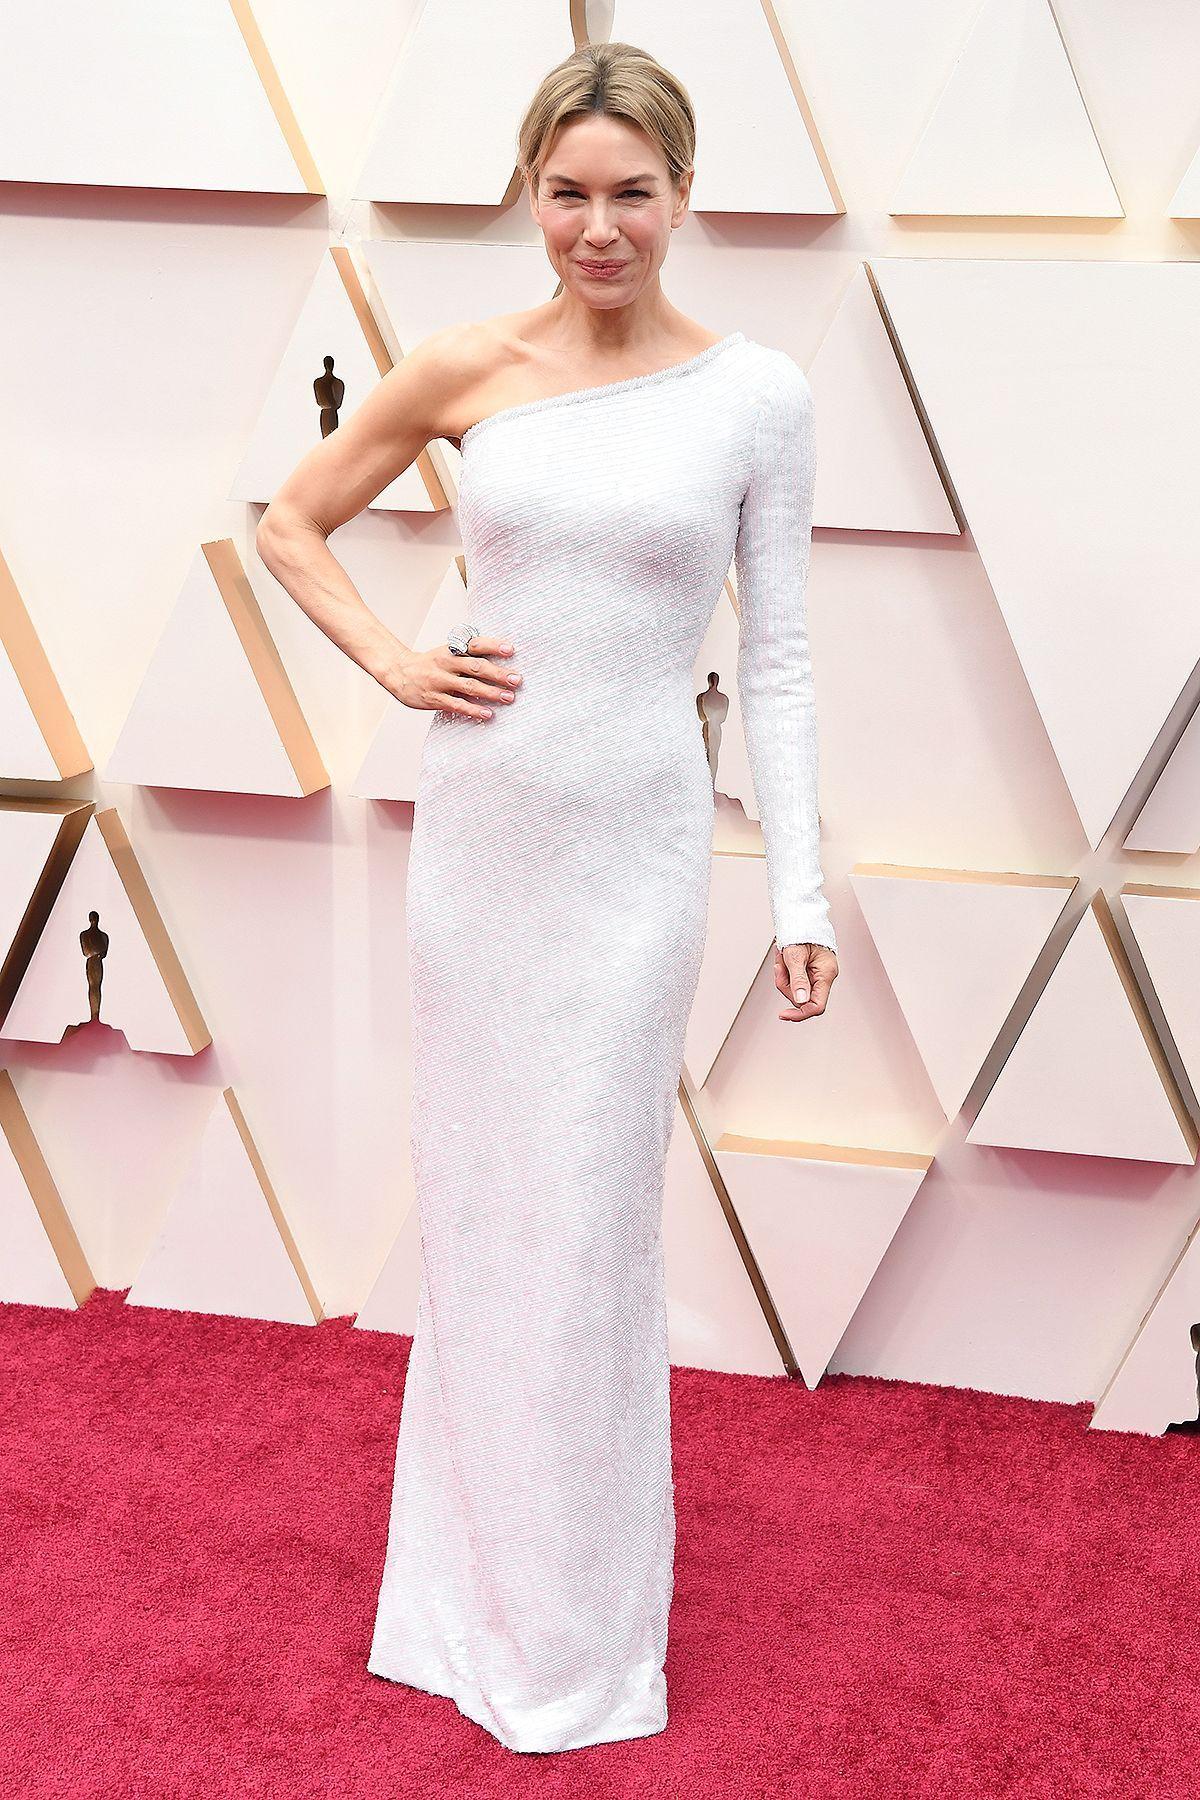 See all the stars on the Oscars red carpet -  Oscars 2020: See all the stars on the red carpet  - #AlexaChung #AngelaSimmons #CannesFilmFestival #Carpet #CelebritiesFashion #CelebrityStyle #CurvyPetiteFashion #DianeKruger #EmmaRoberts #FashionDesigners #FashionTrends #KendallJennerOutfits #KimKardashian #LouisVuitton #LouisVuittonHandbags #LouisVuittonMonogram #LvHandbags #MichaelKorsBag #MiraDuma #MiroslavaDuma #Oscars #RachelBilson #RayBanOutlet #RayBanSunglasses #RayBans #Red #RedCarpetDress